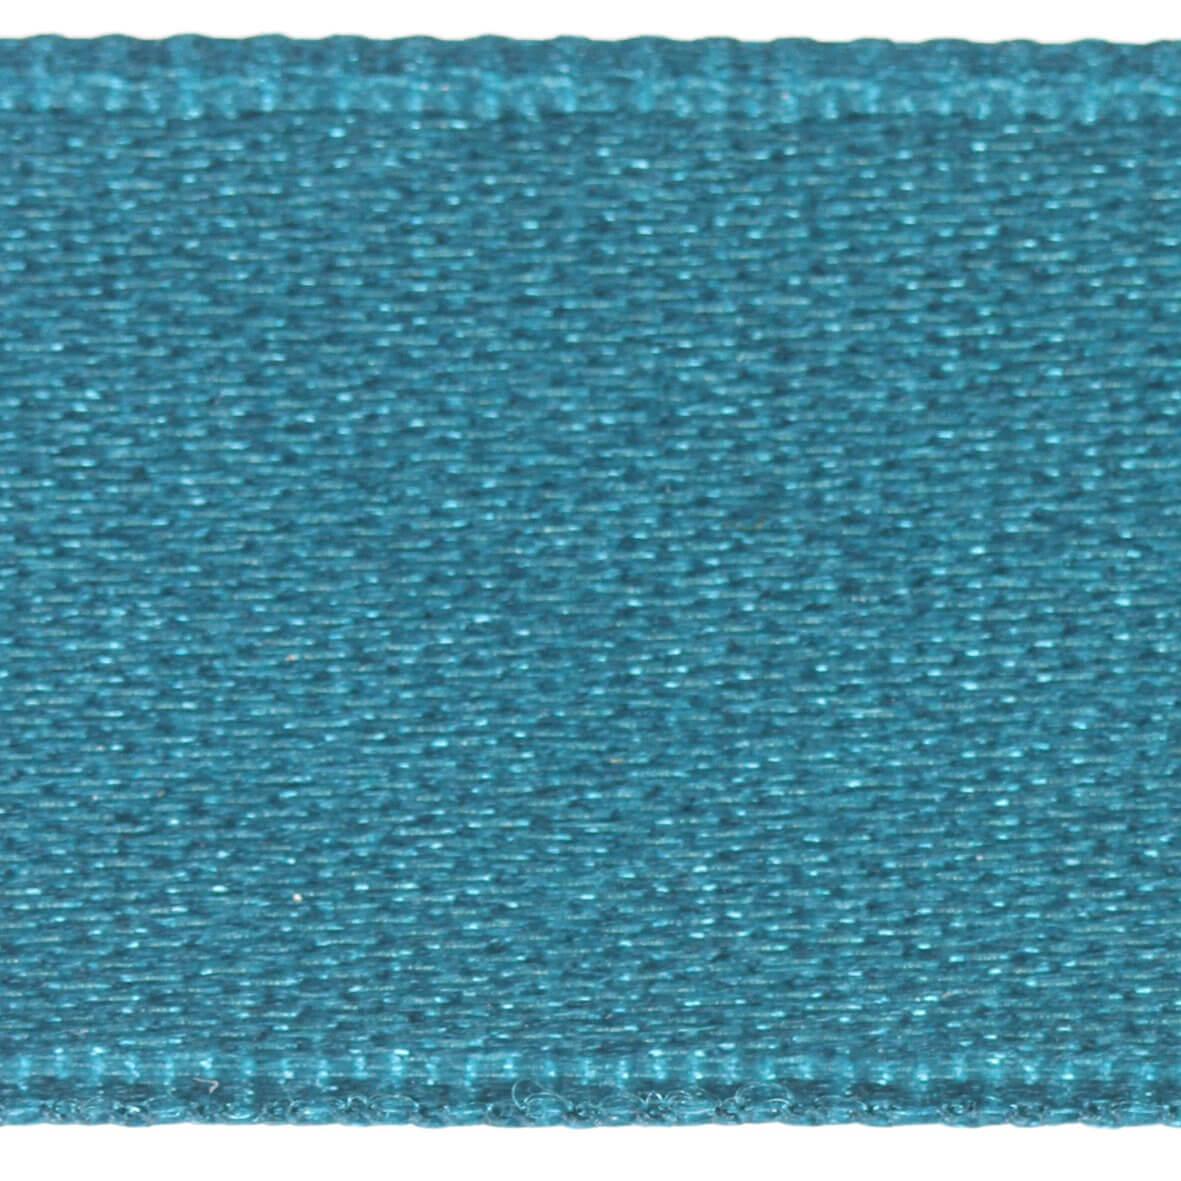 Mediterranian Blue Col. 269 - 25mm Satab Satin Ribbon